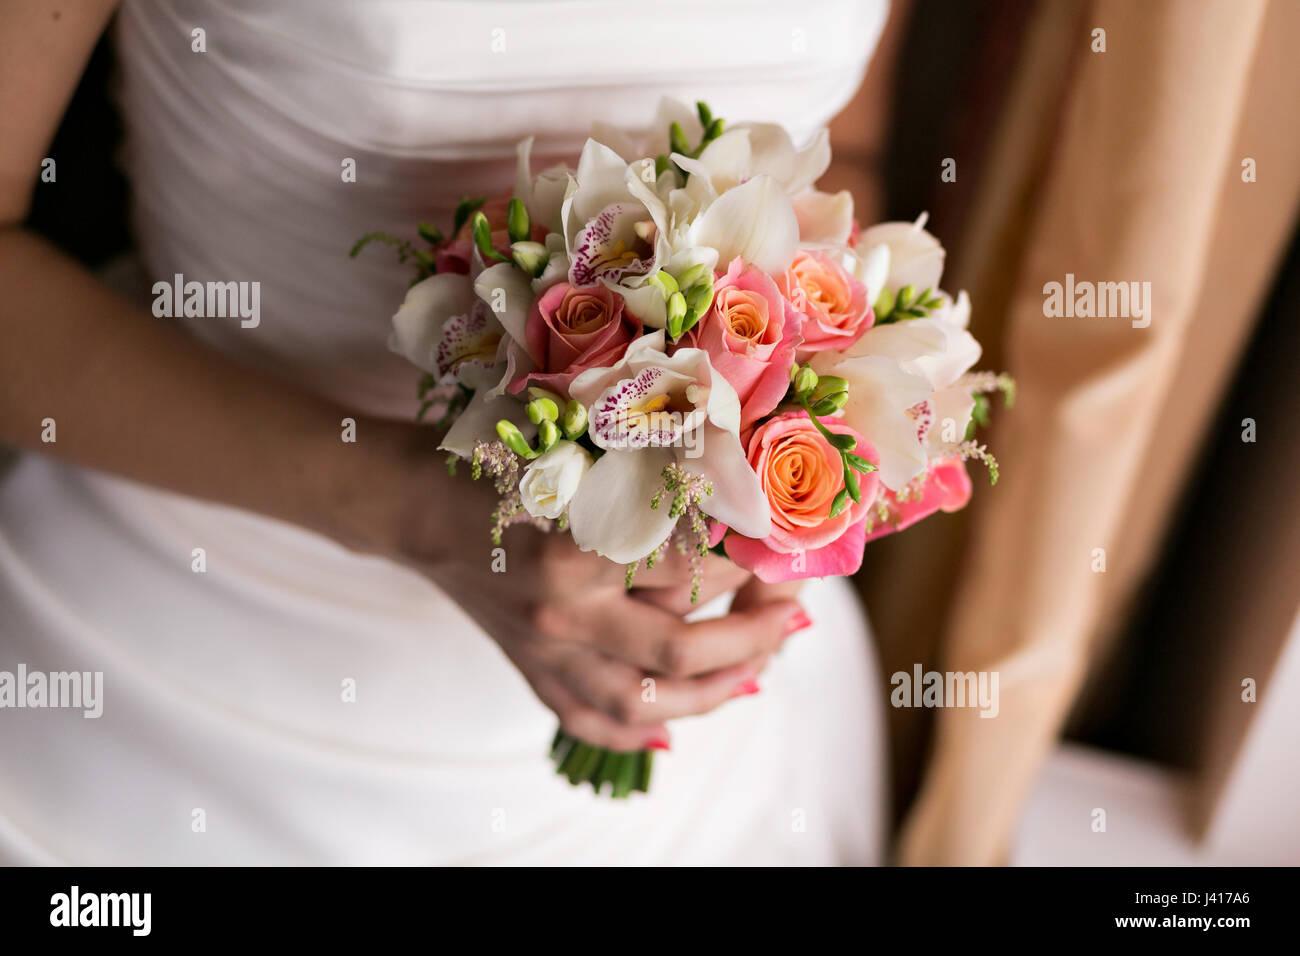 braut h lt brautstrau hautnah rosa und wei e rosen freesien brunia dekoriert in. Black Bedroom Furniture Sets. Home Design Ideas